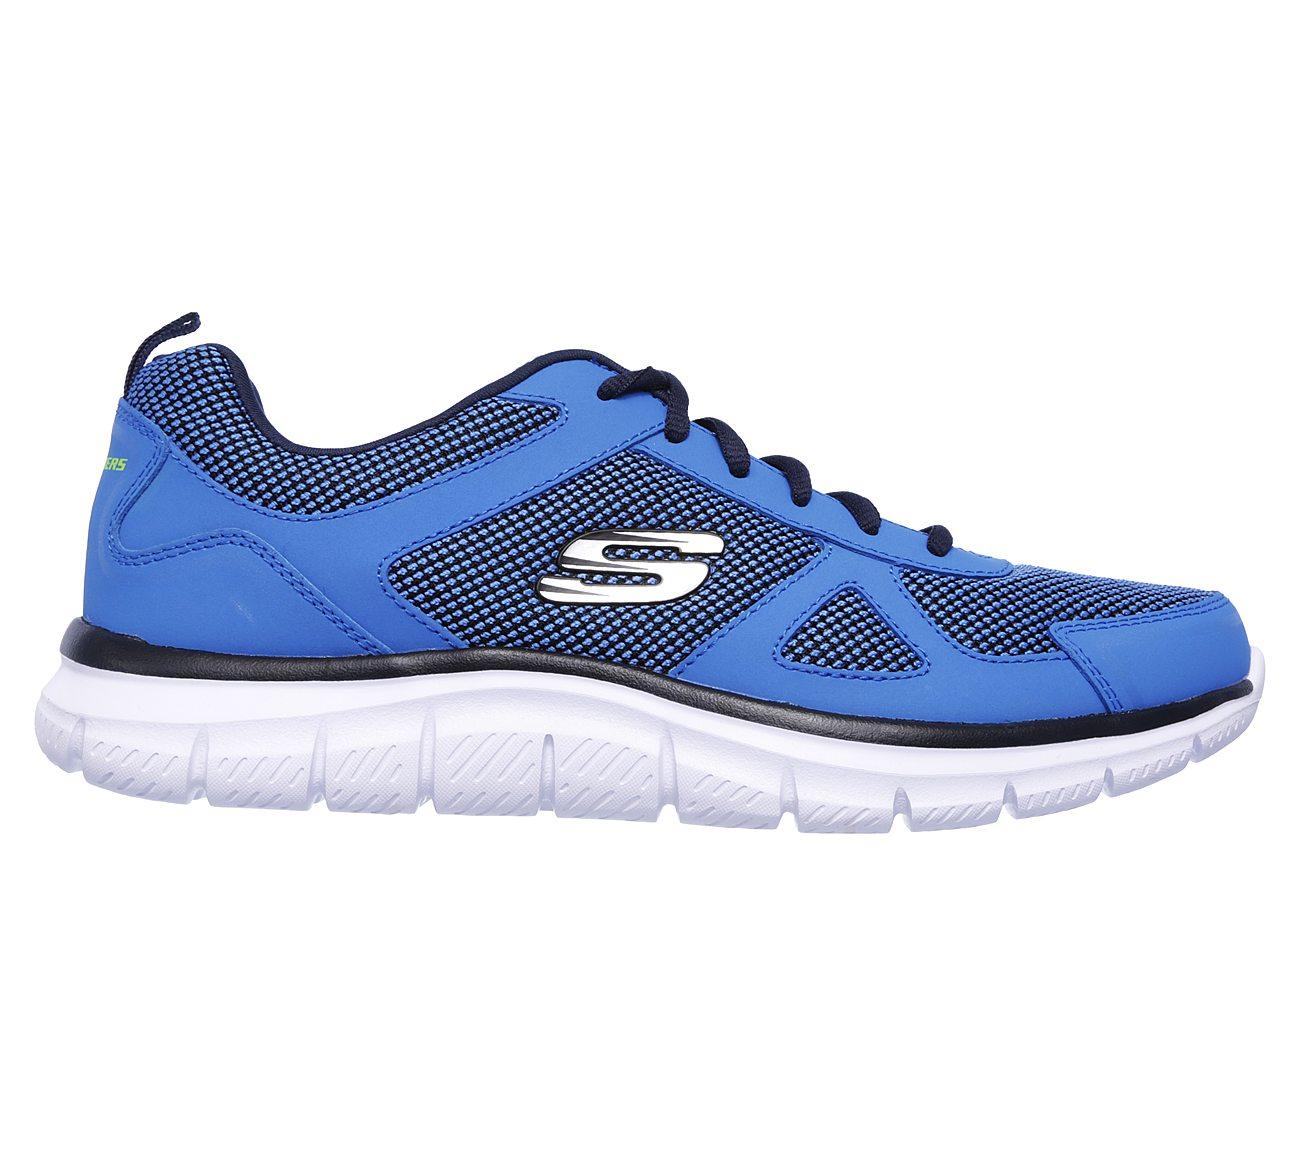 Details about Skechers Track Bucolo Mens Blue Lace Up Gym Memory Foam Sport show original title